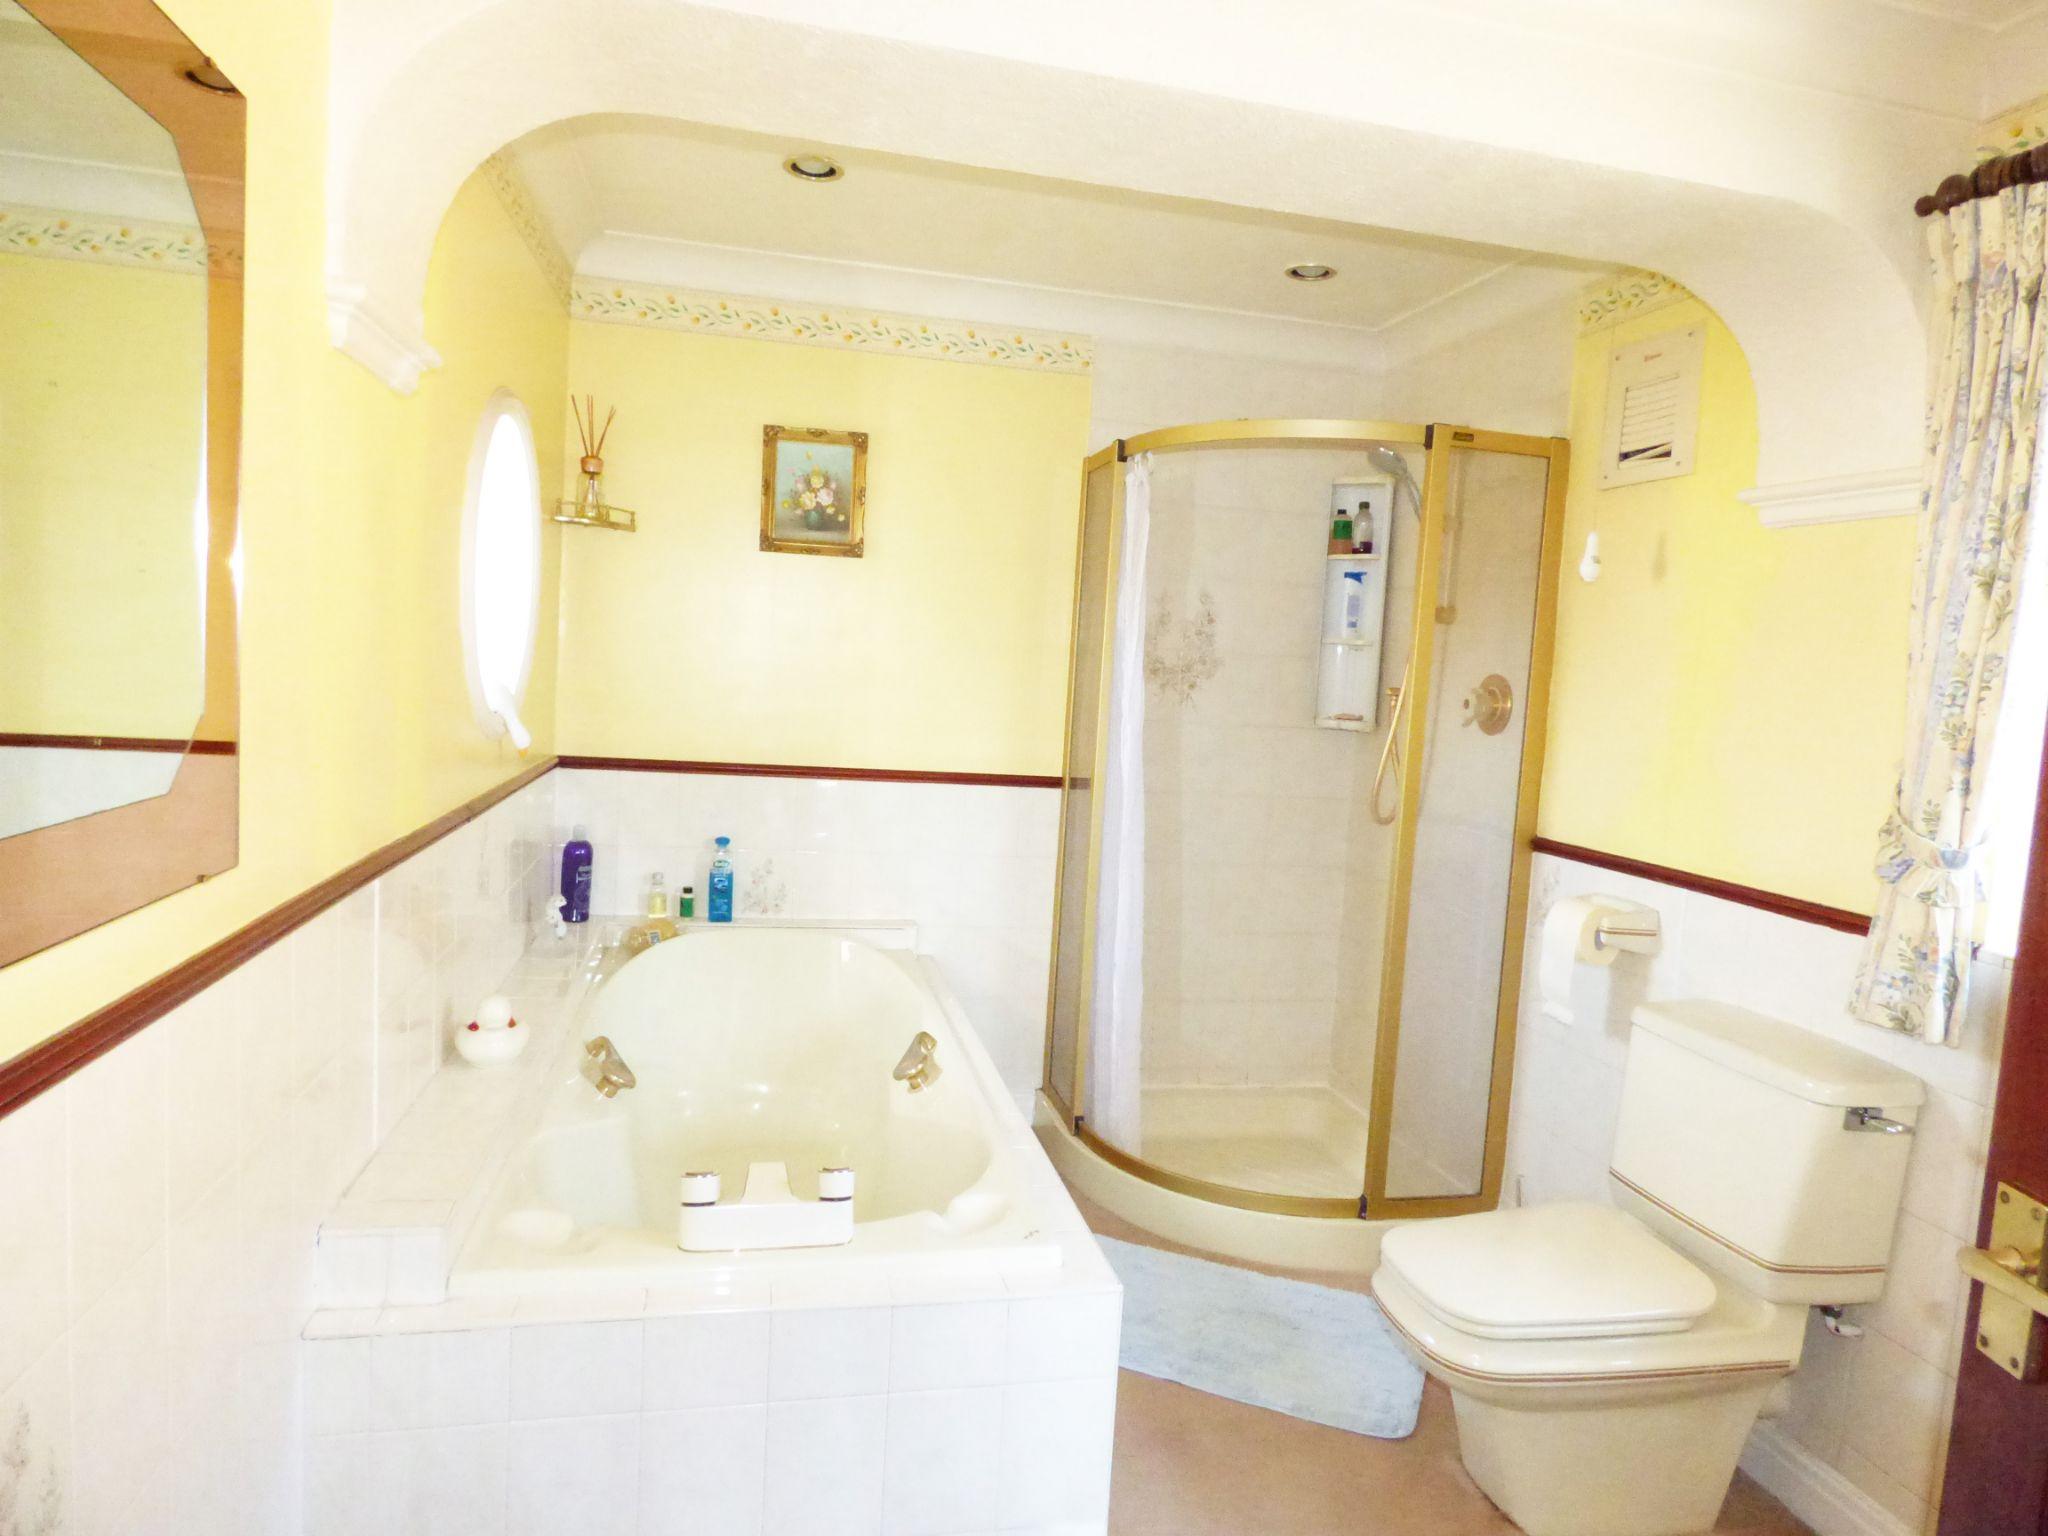 3 Bedroom Detached House For Sale - Bathroom